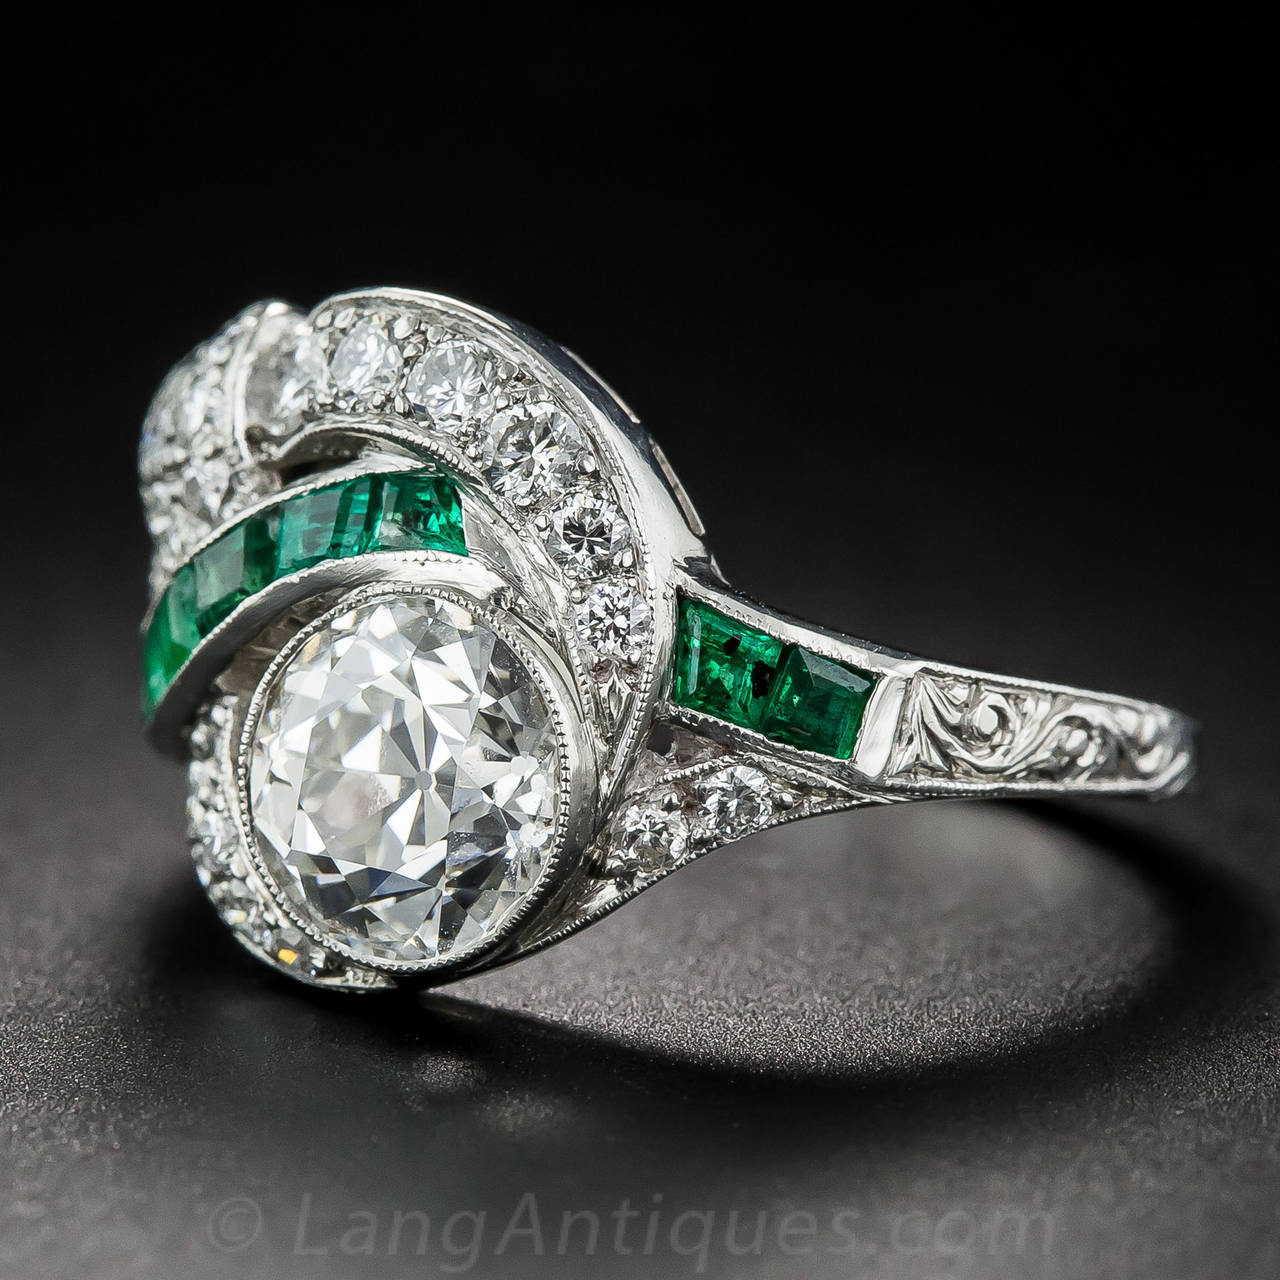 Art Deco 1.97 Carat Center Diamond and Emerald Ring 5